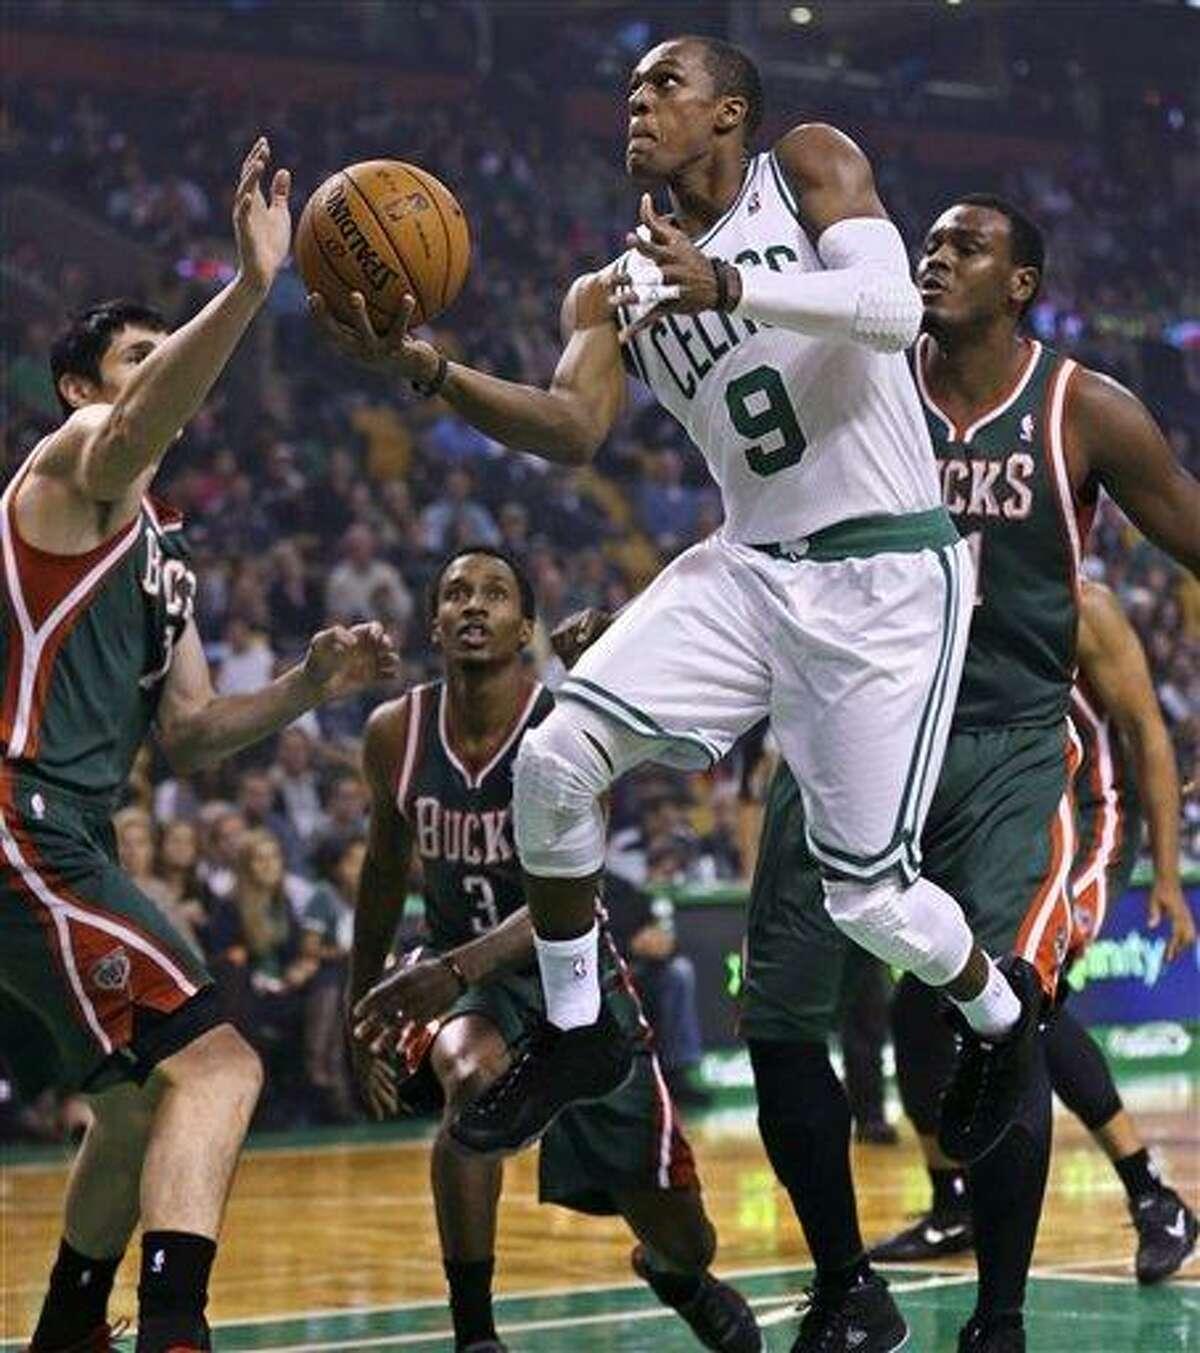 Boston Celtics guard Rajon Rondo drives to the basket against the Milwaukee Bucks in the first quarter of an NBA basketball game in Boston, Friday, Nov. 2, 2012. (AP Photo/Charles Krupa)